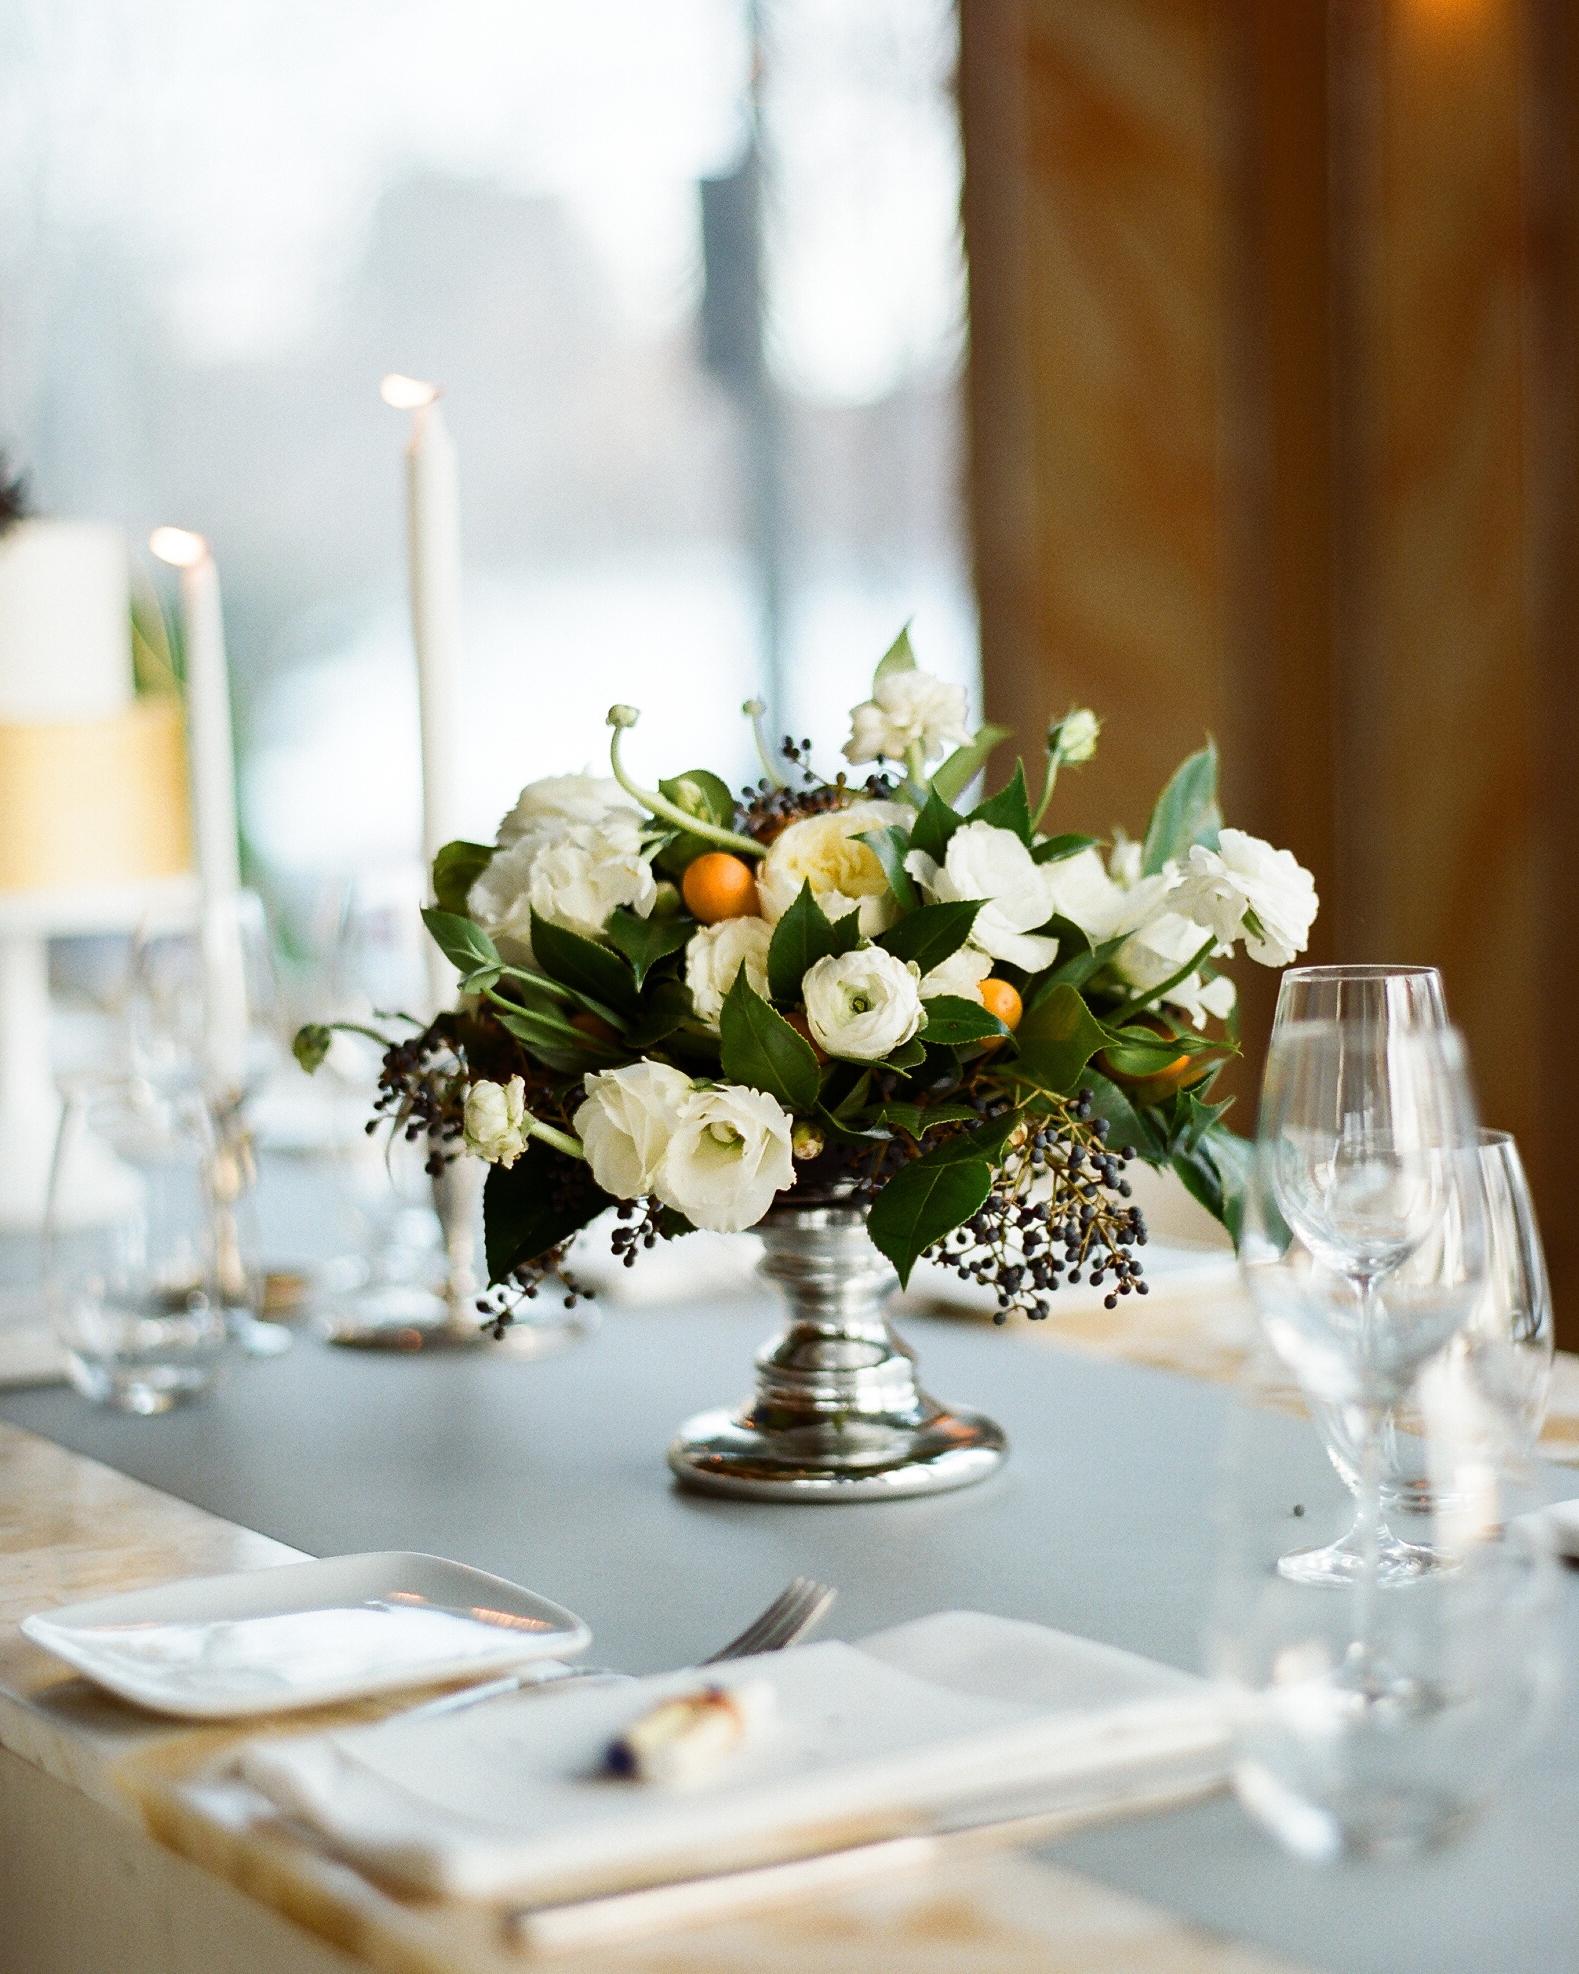 molly-sam-wedding-table1-0614.jpg